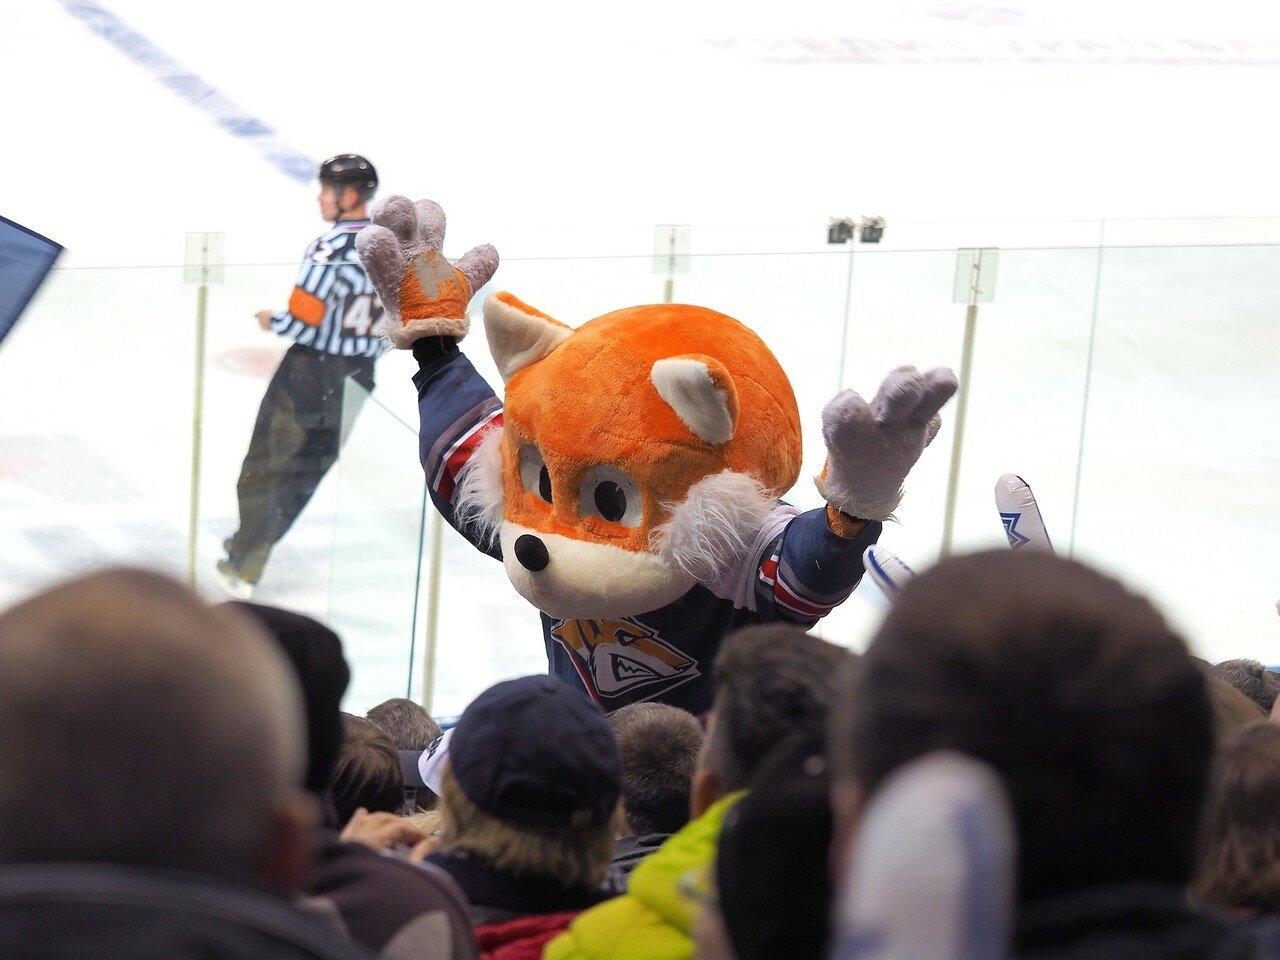 49Плей-офф 2016 Восток 1/2 Металлург - Сибирь 16.03.2016